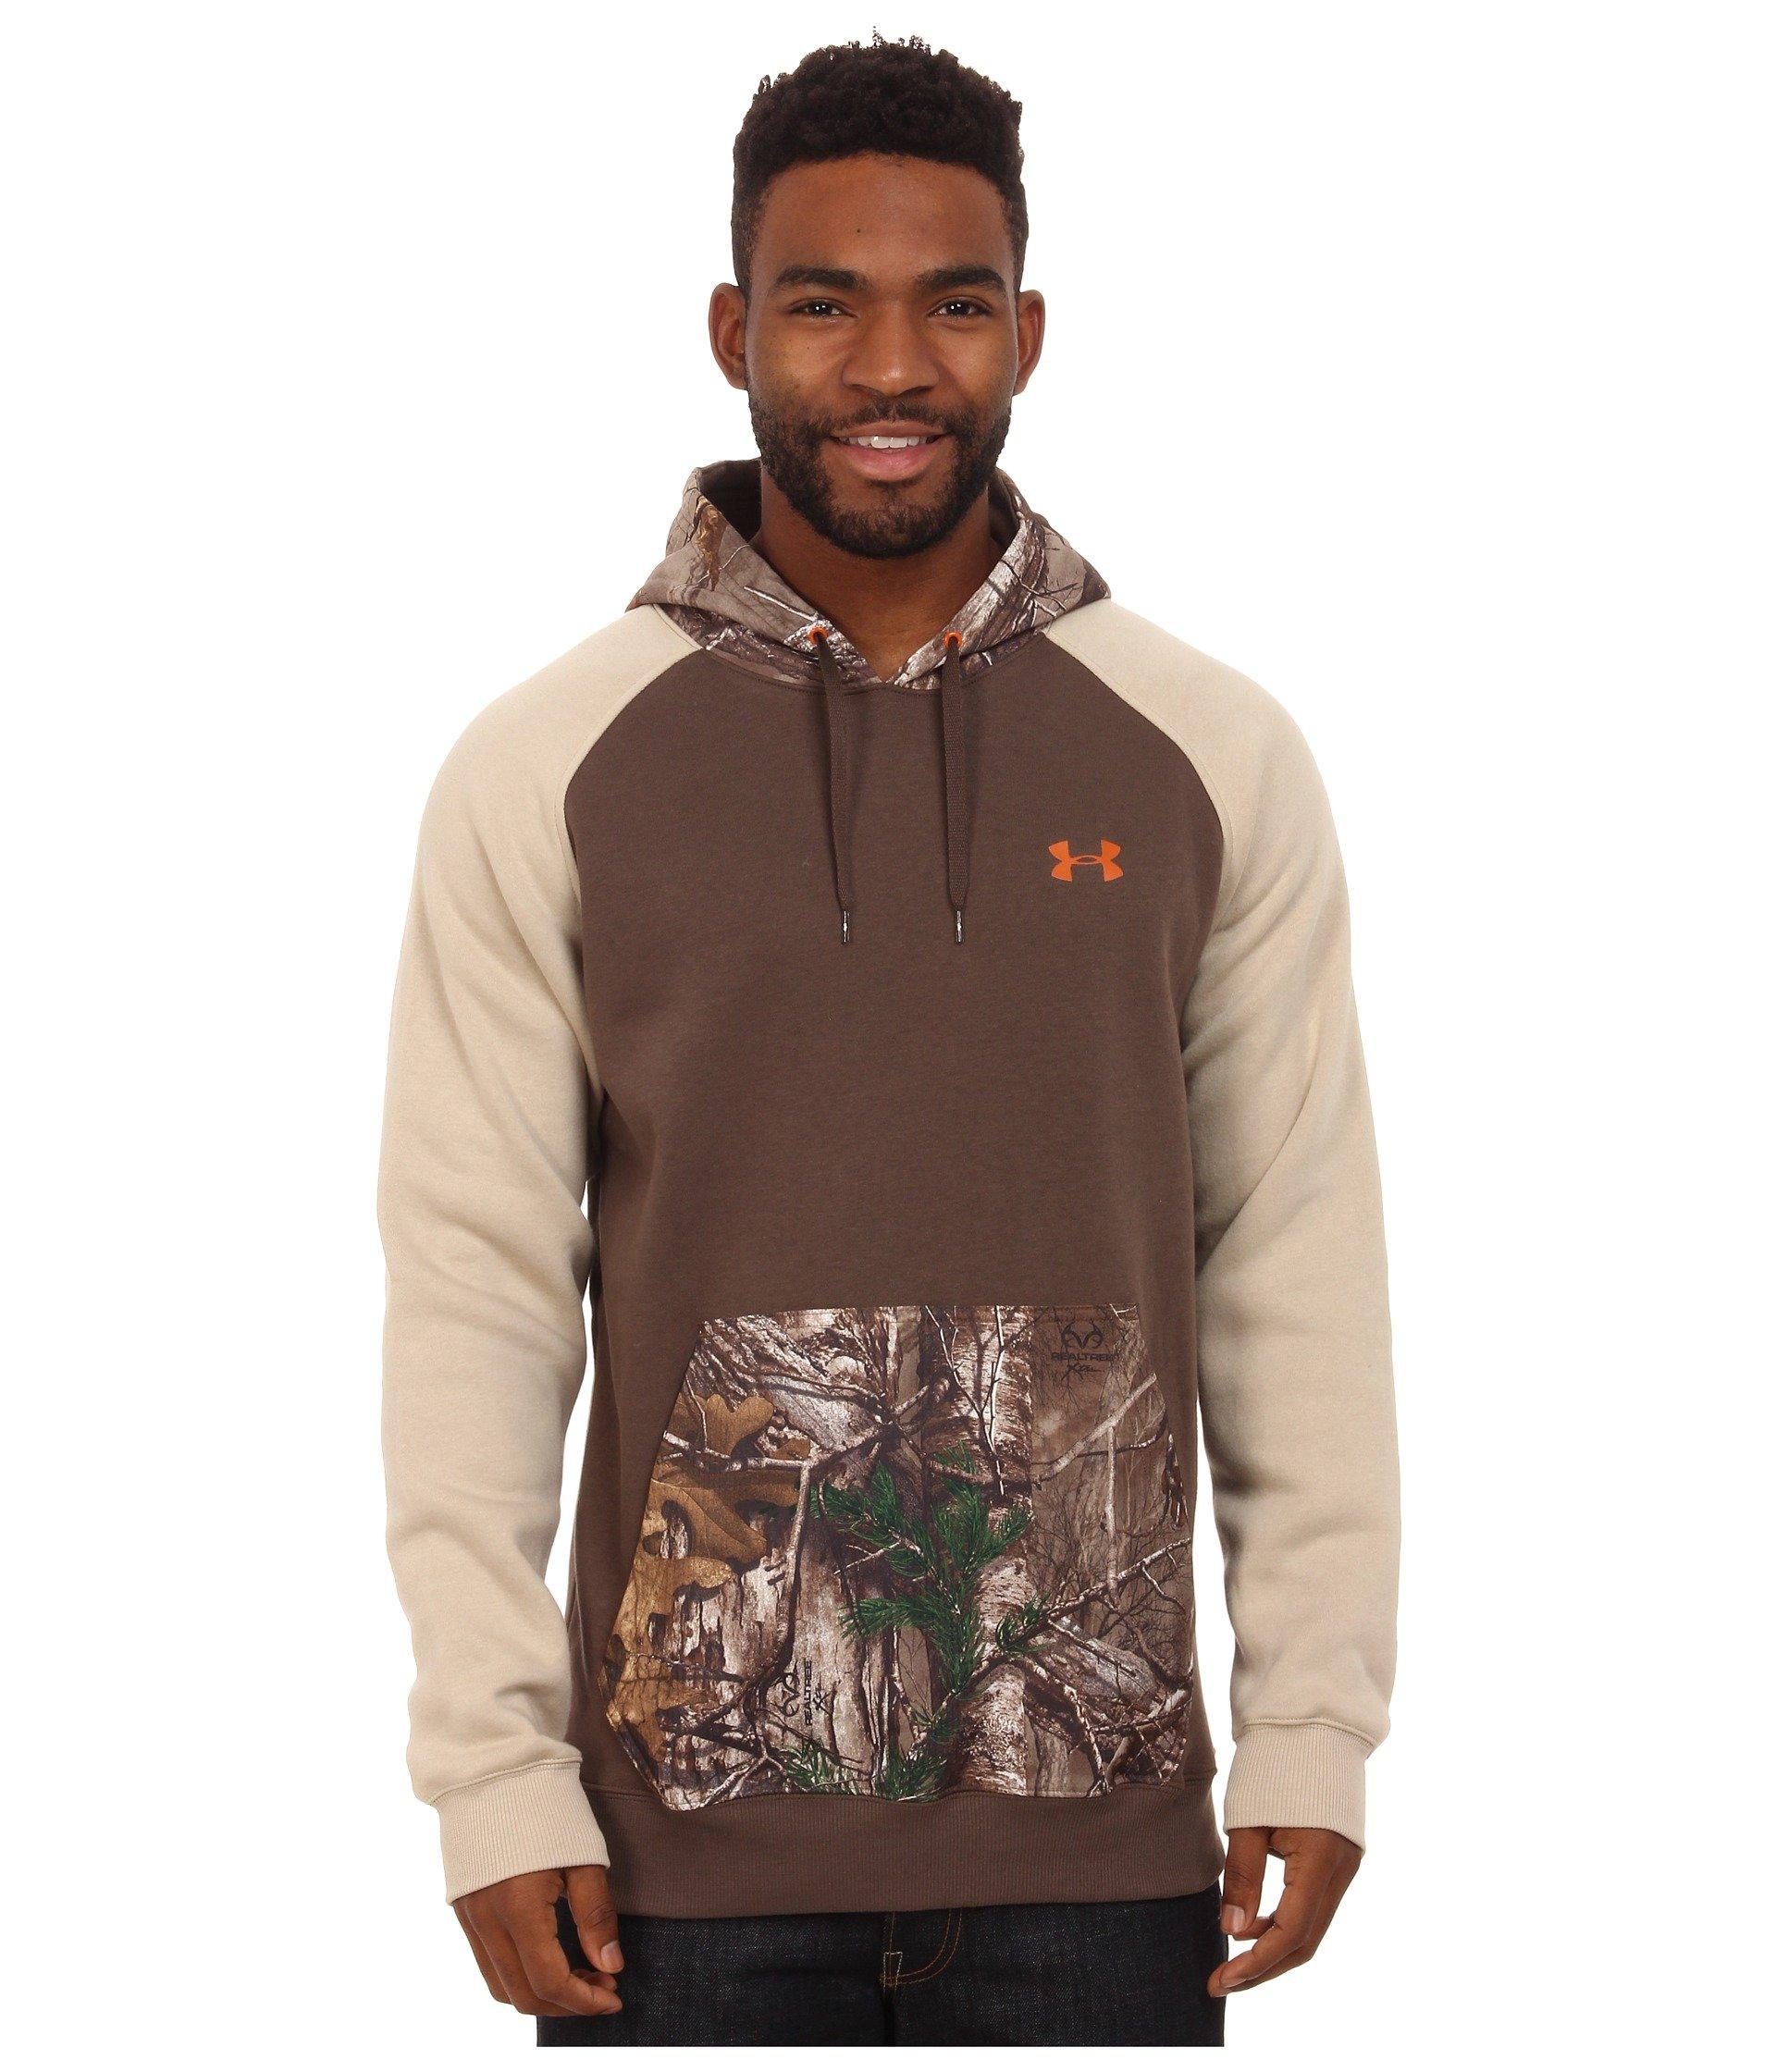 Under Armour UA Realtree TERMINATOR CAMO HEARTHSTONE Sweatshirt Hoodie Men's XL